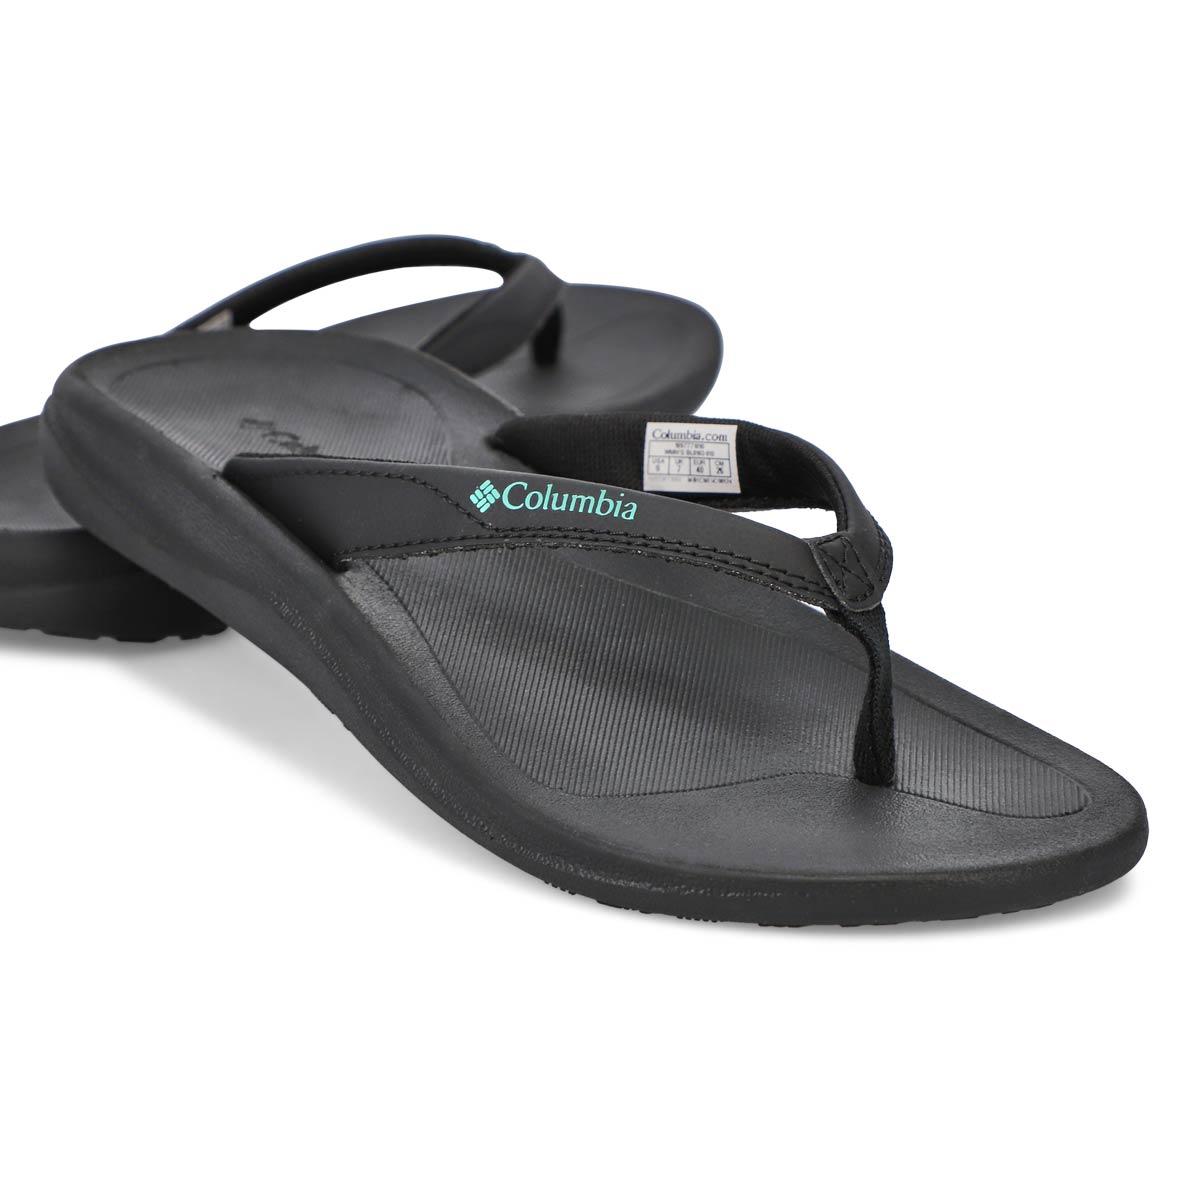 Womens' Columbia Flip Sandal - Black/Copper